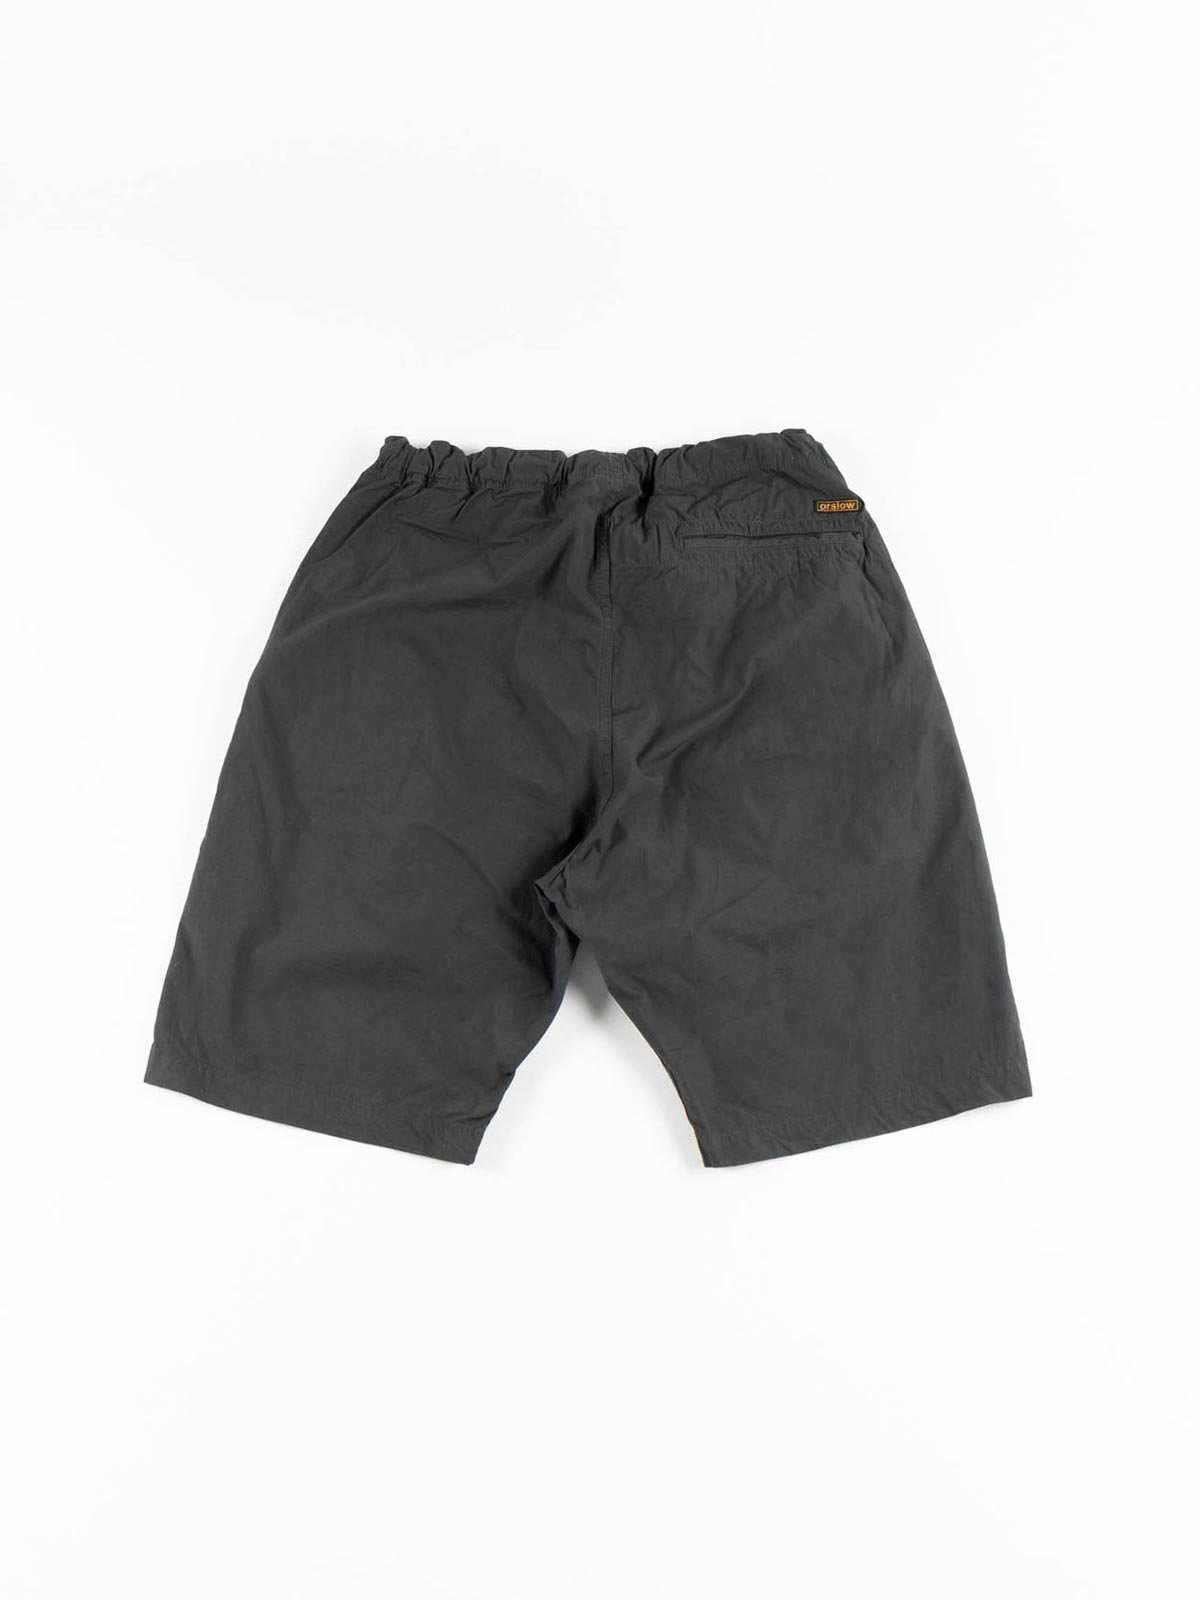 NEW YORKER SHORTS GRAY COTTON TYPEWRITER CLOTH - Image 4